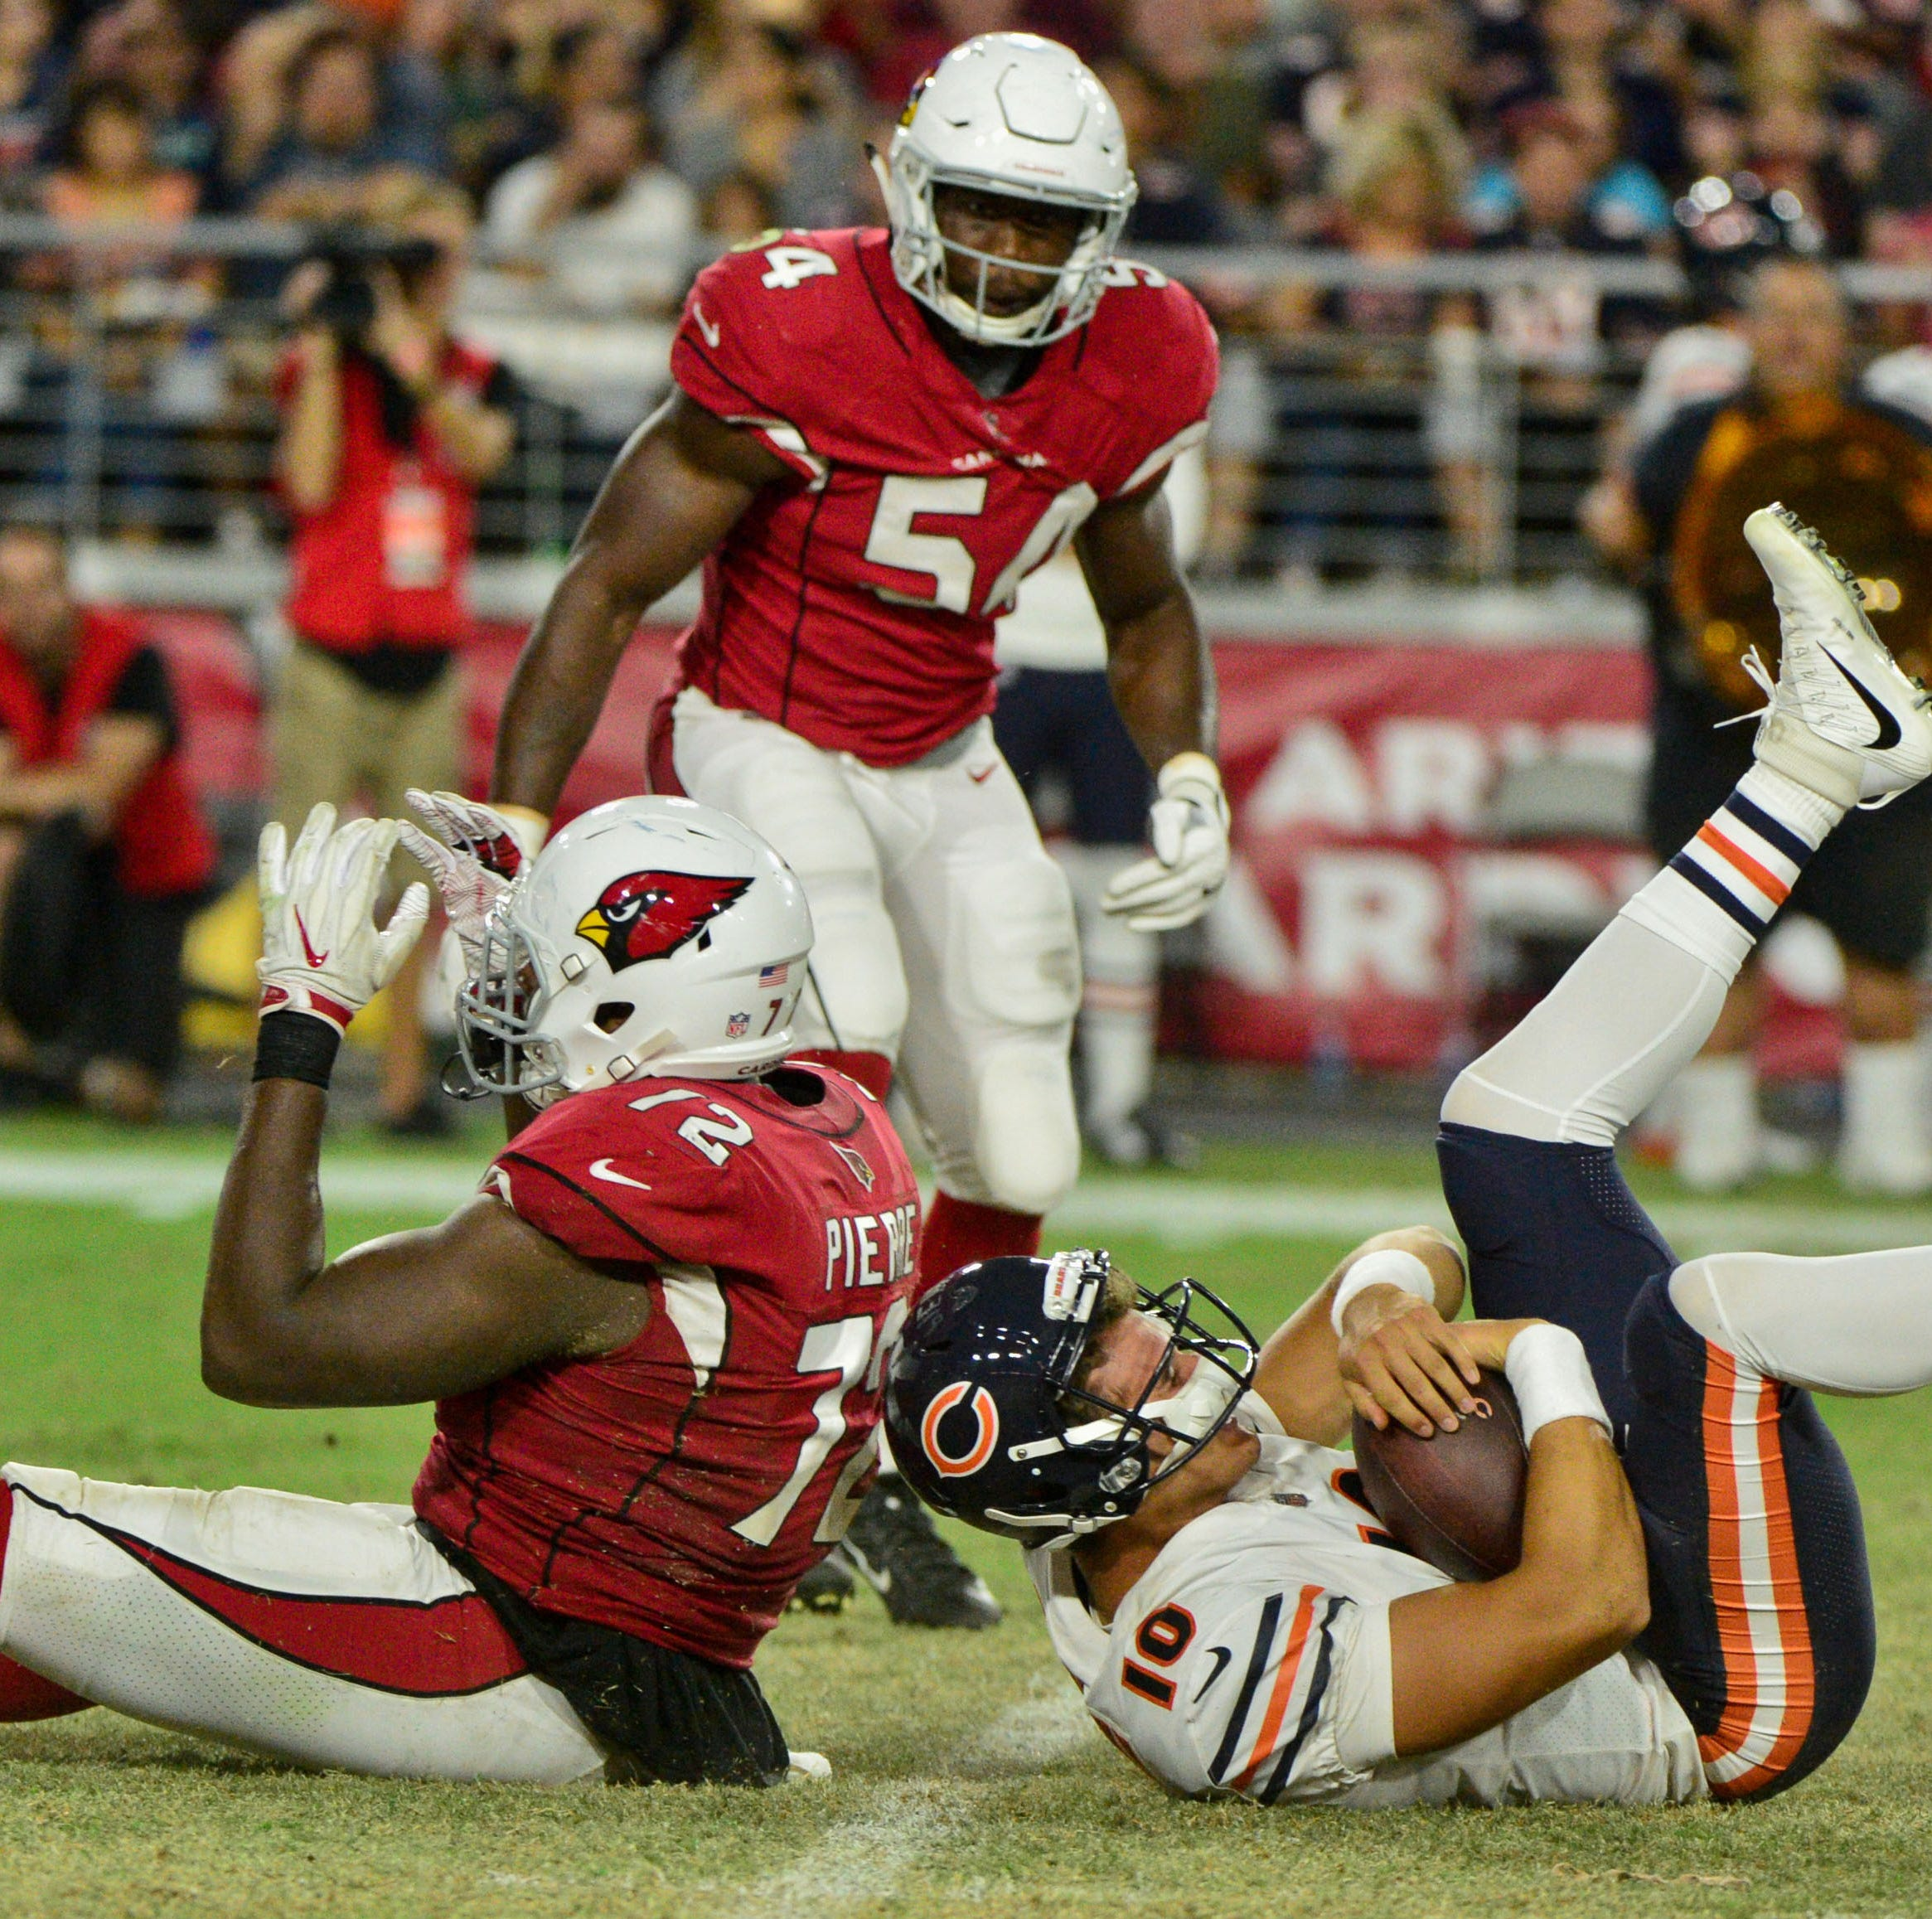 Chicago Bears vs. Arizona Cardinals picks, predictions: Who will win NFL Week 3 game?